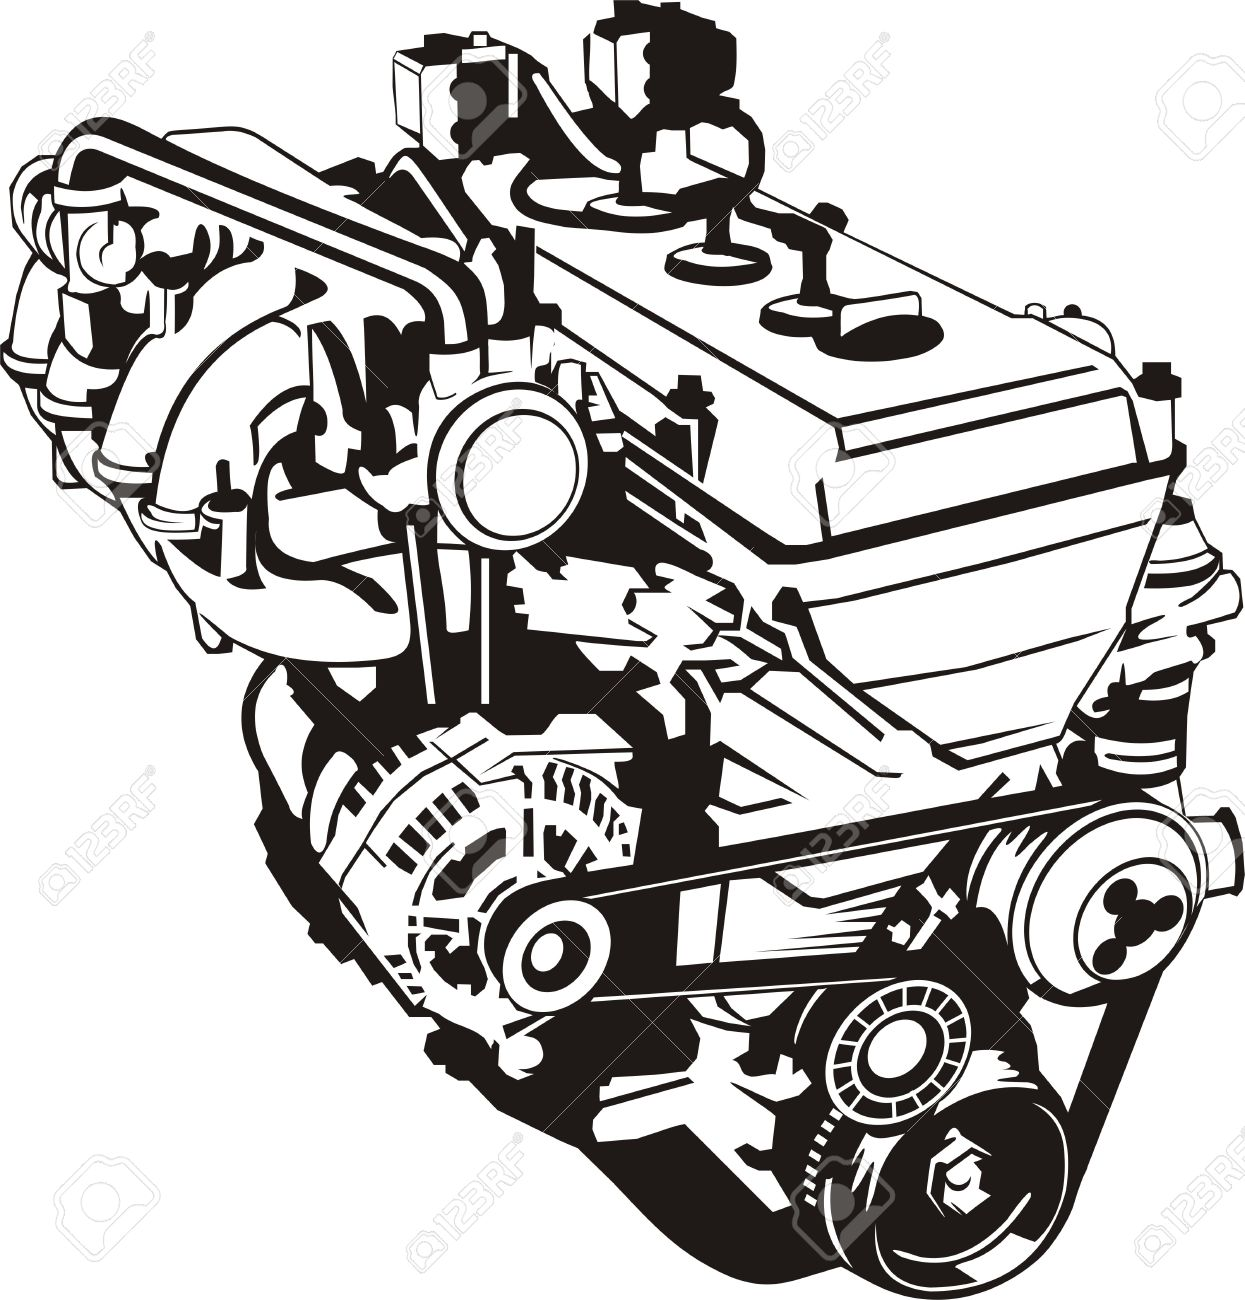 Engine clipart diesel engine Clipart engine Internal combustion engine